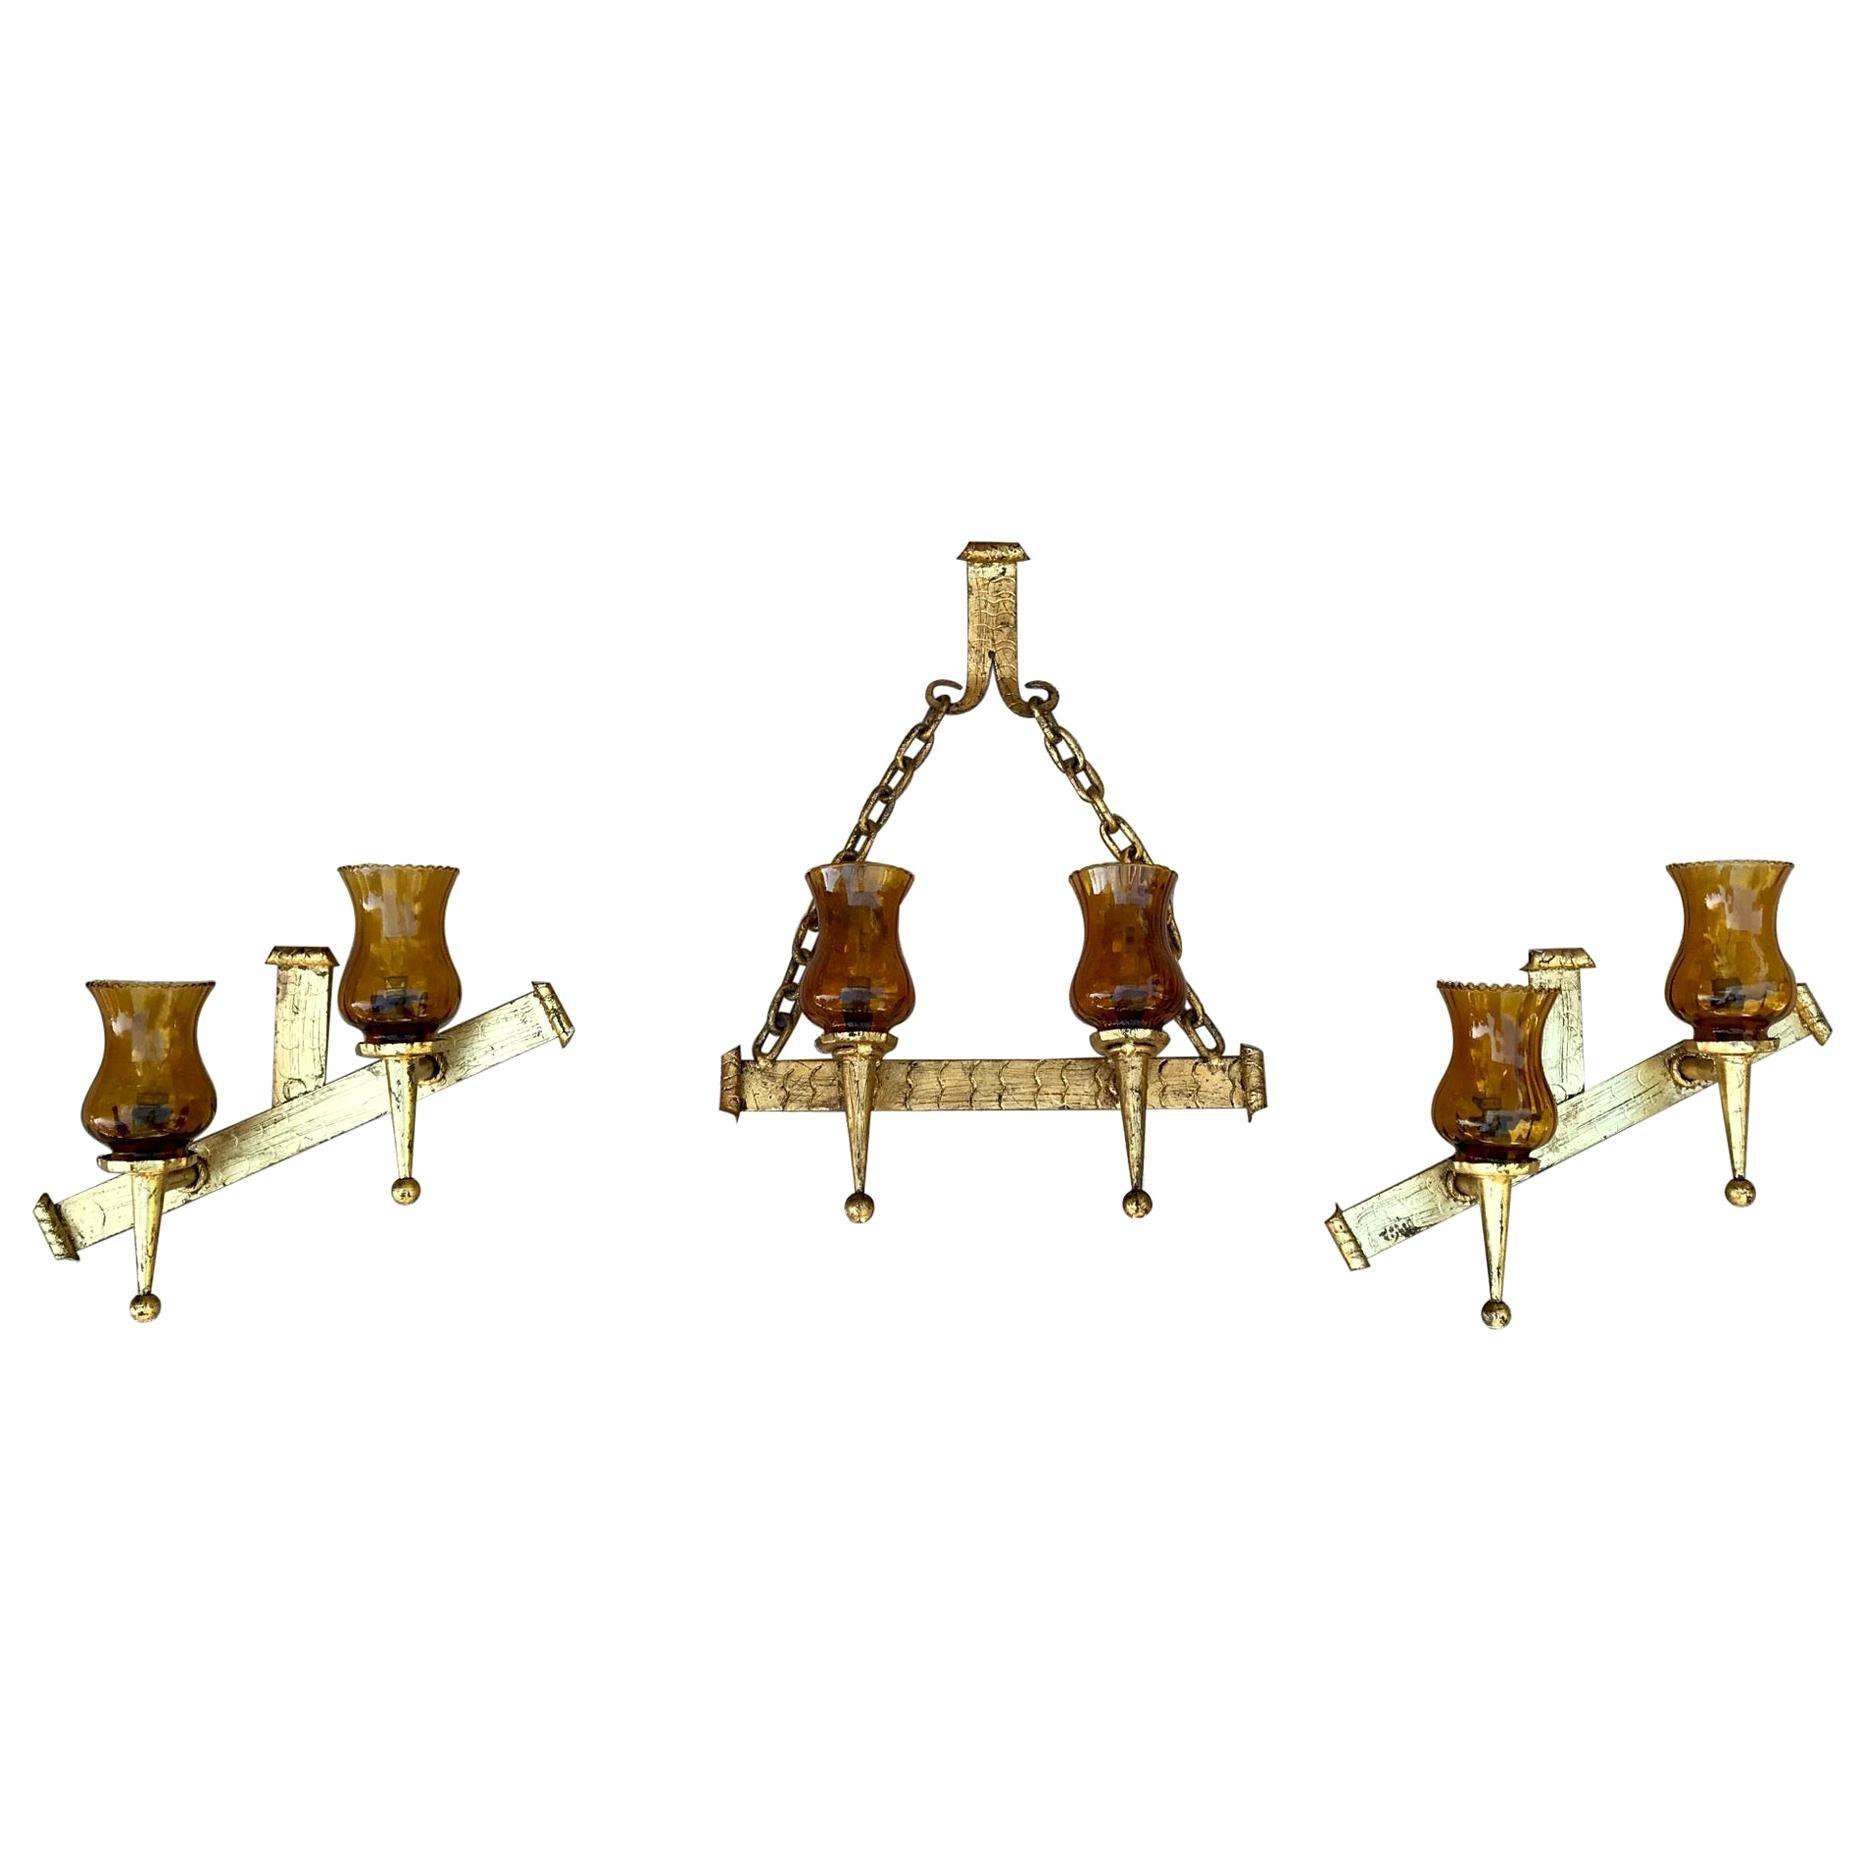 20th Century Set of French Decorative Gilt Wrought Iron Sconces